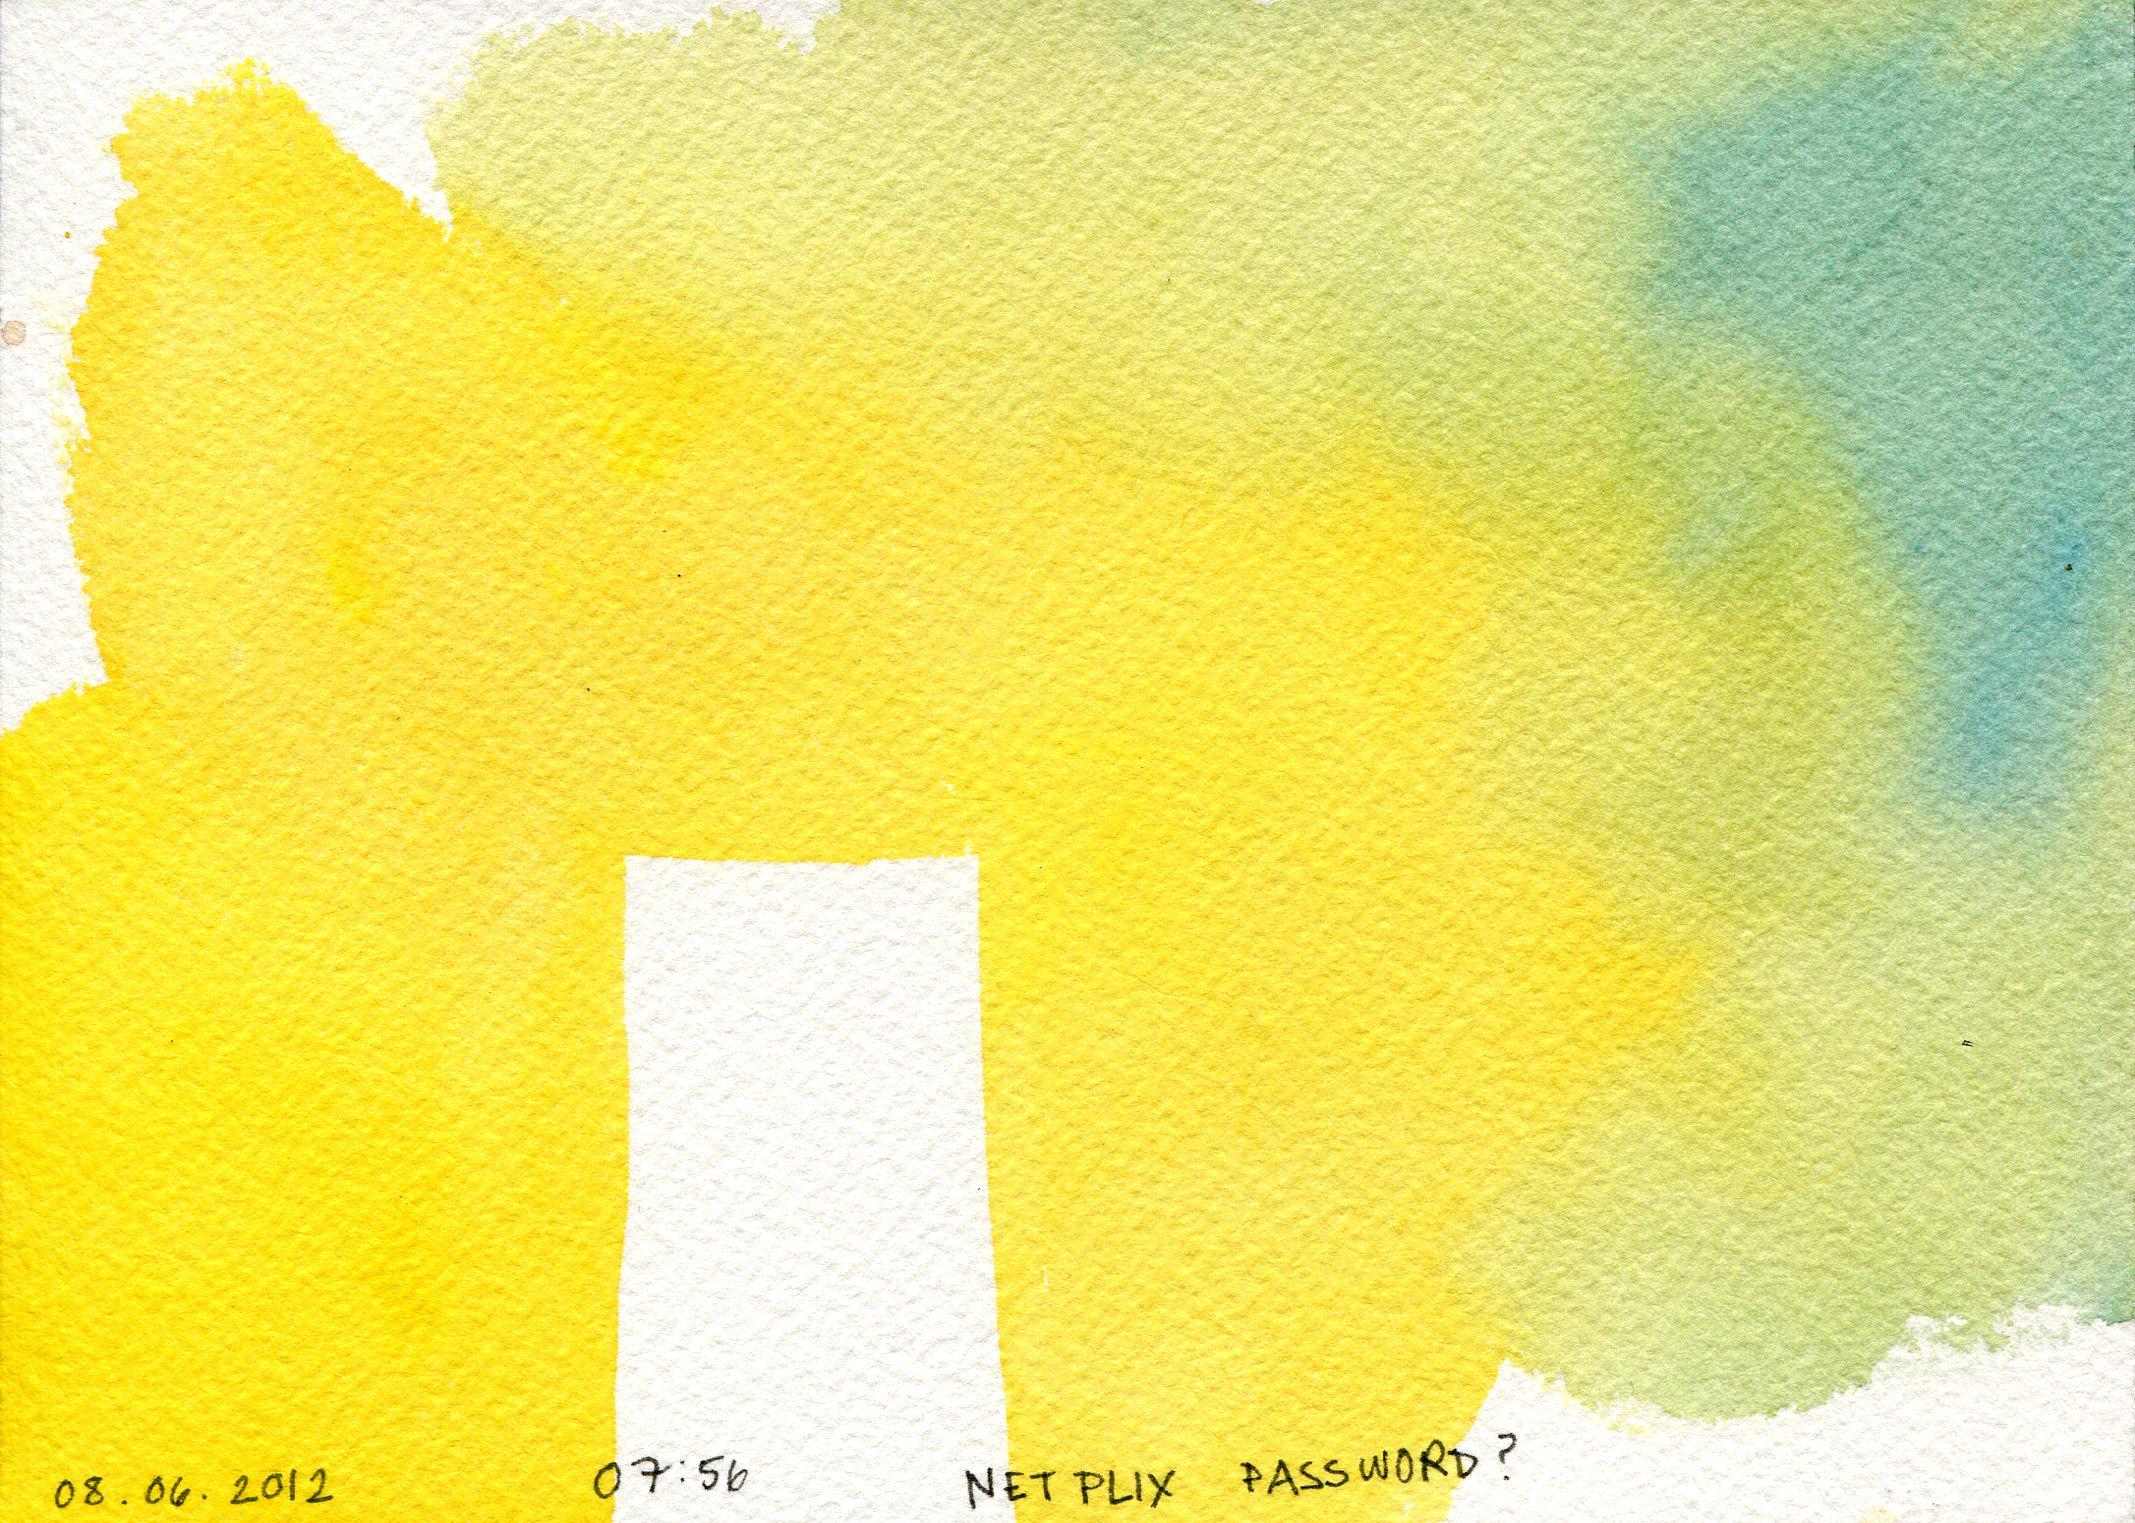 2012-08-06 drawing006.jpg